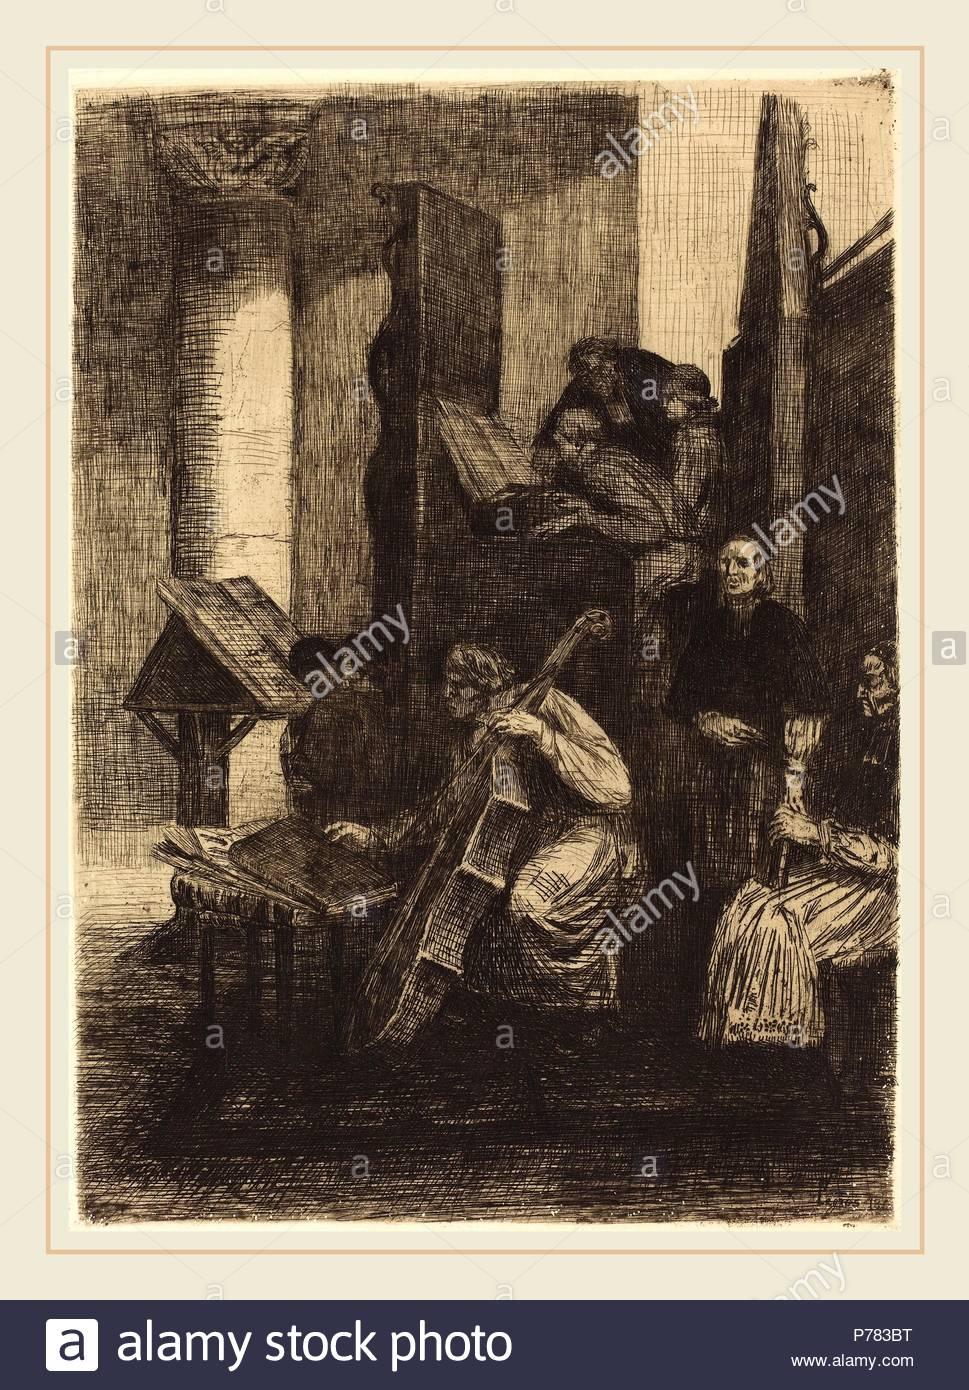 Alphonse Legros (French, 1837-1911), Choir in a Spanish Church (Le choeur d'une eglise espagnole), 1860, etching. - Stock Image